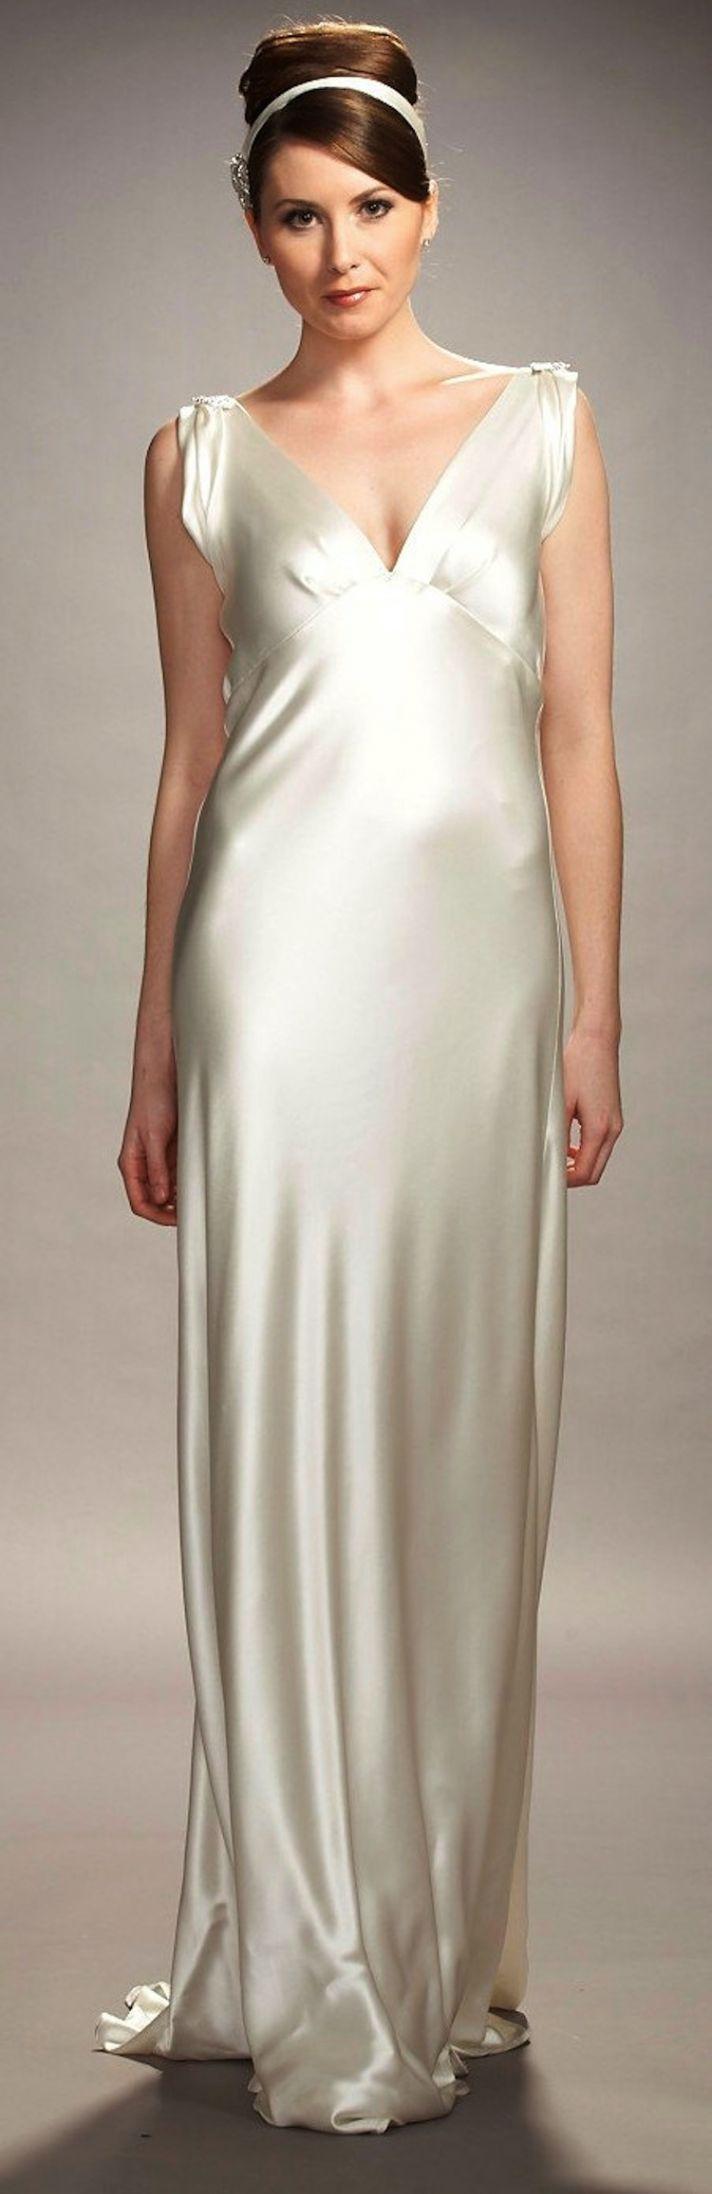 Sleek and elegant liquid satin wedding dresses ire wraith costume